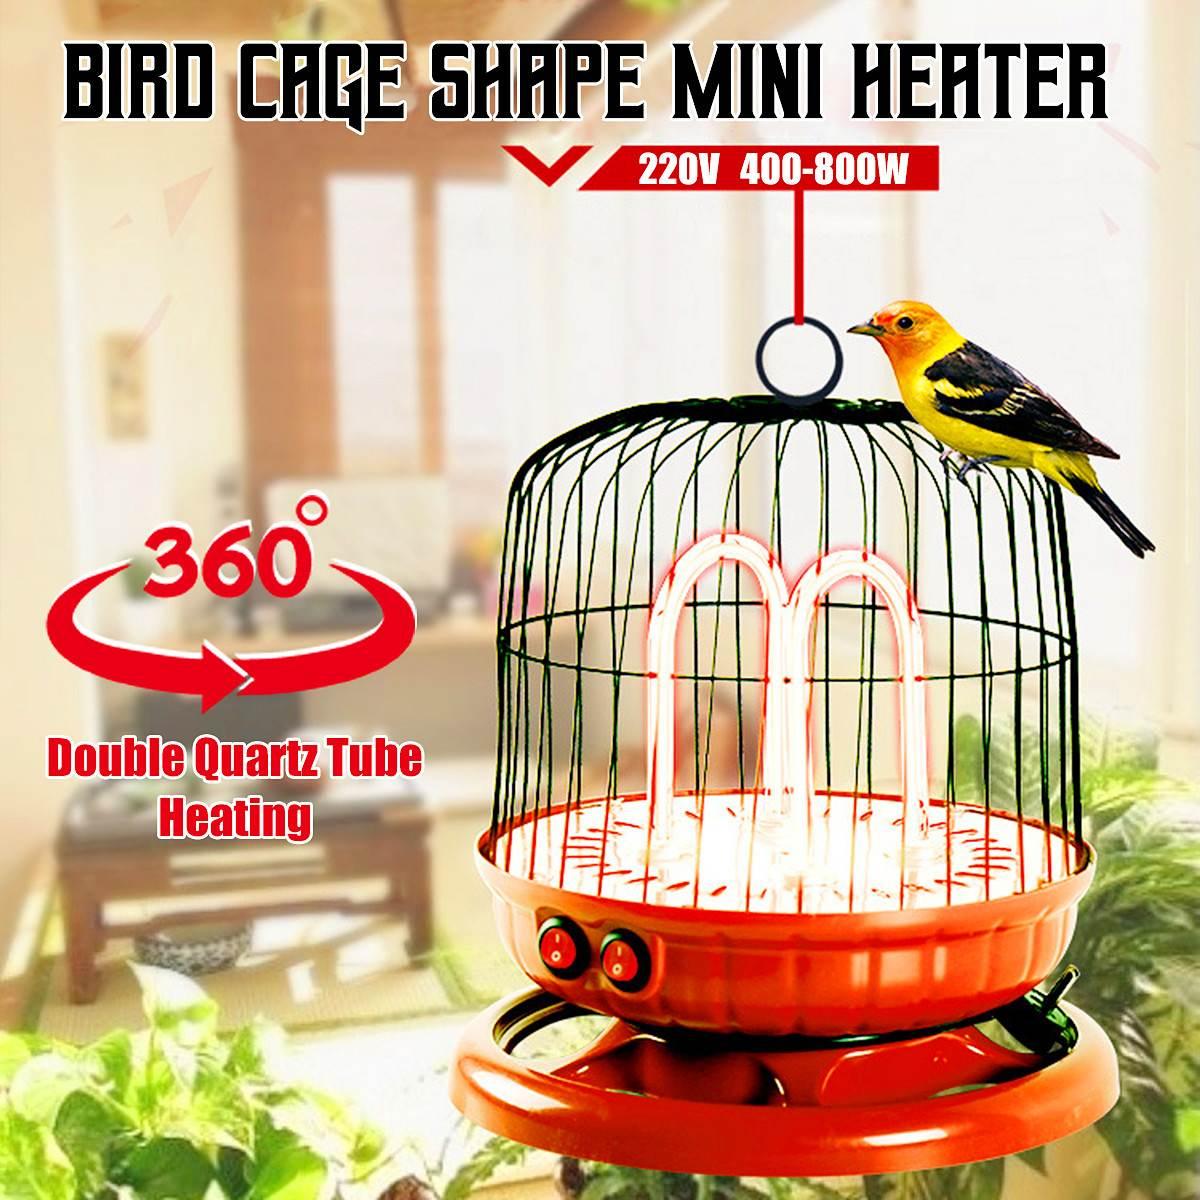 4x Electric Fan Room Heaters 220V 400 800W Energy Saving Bird Cage Shape Desktop Heating Device